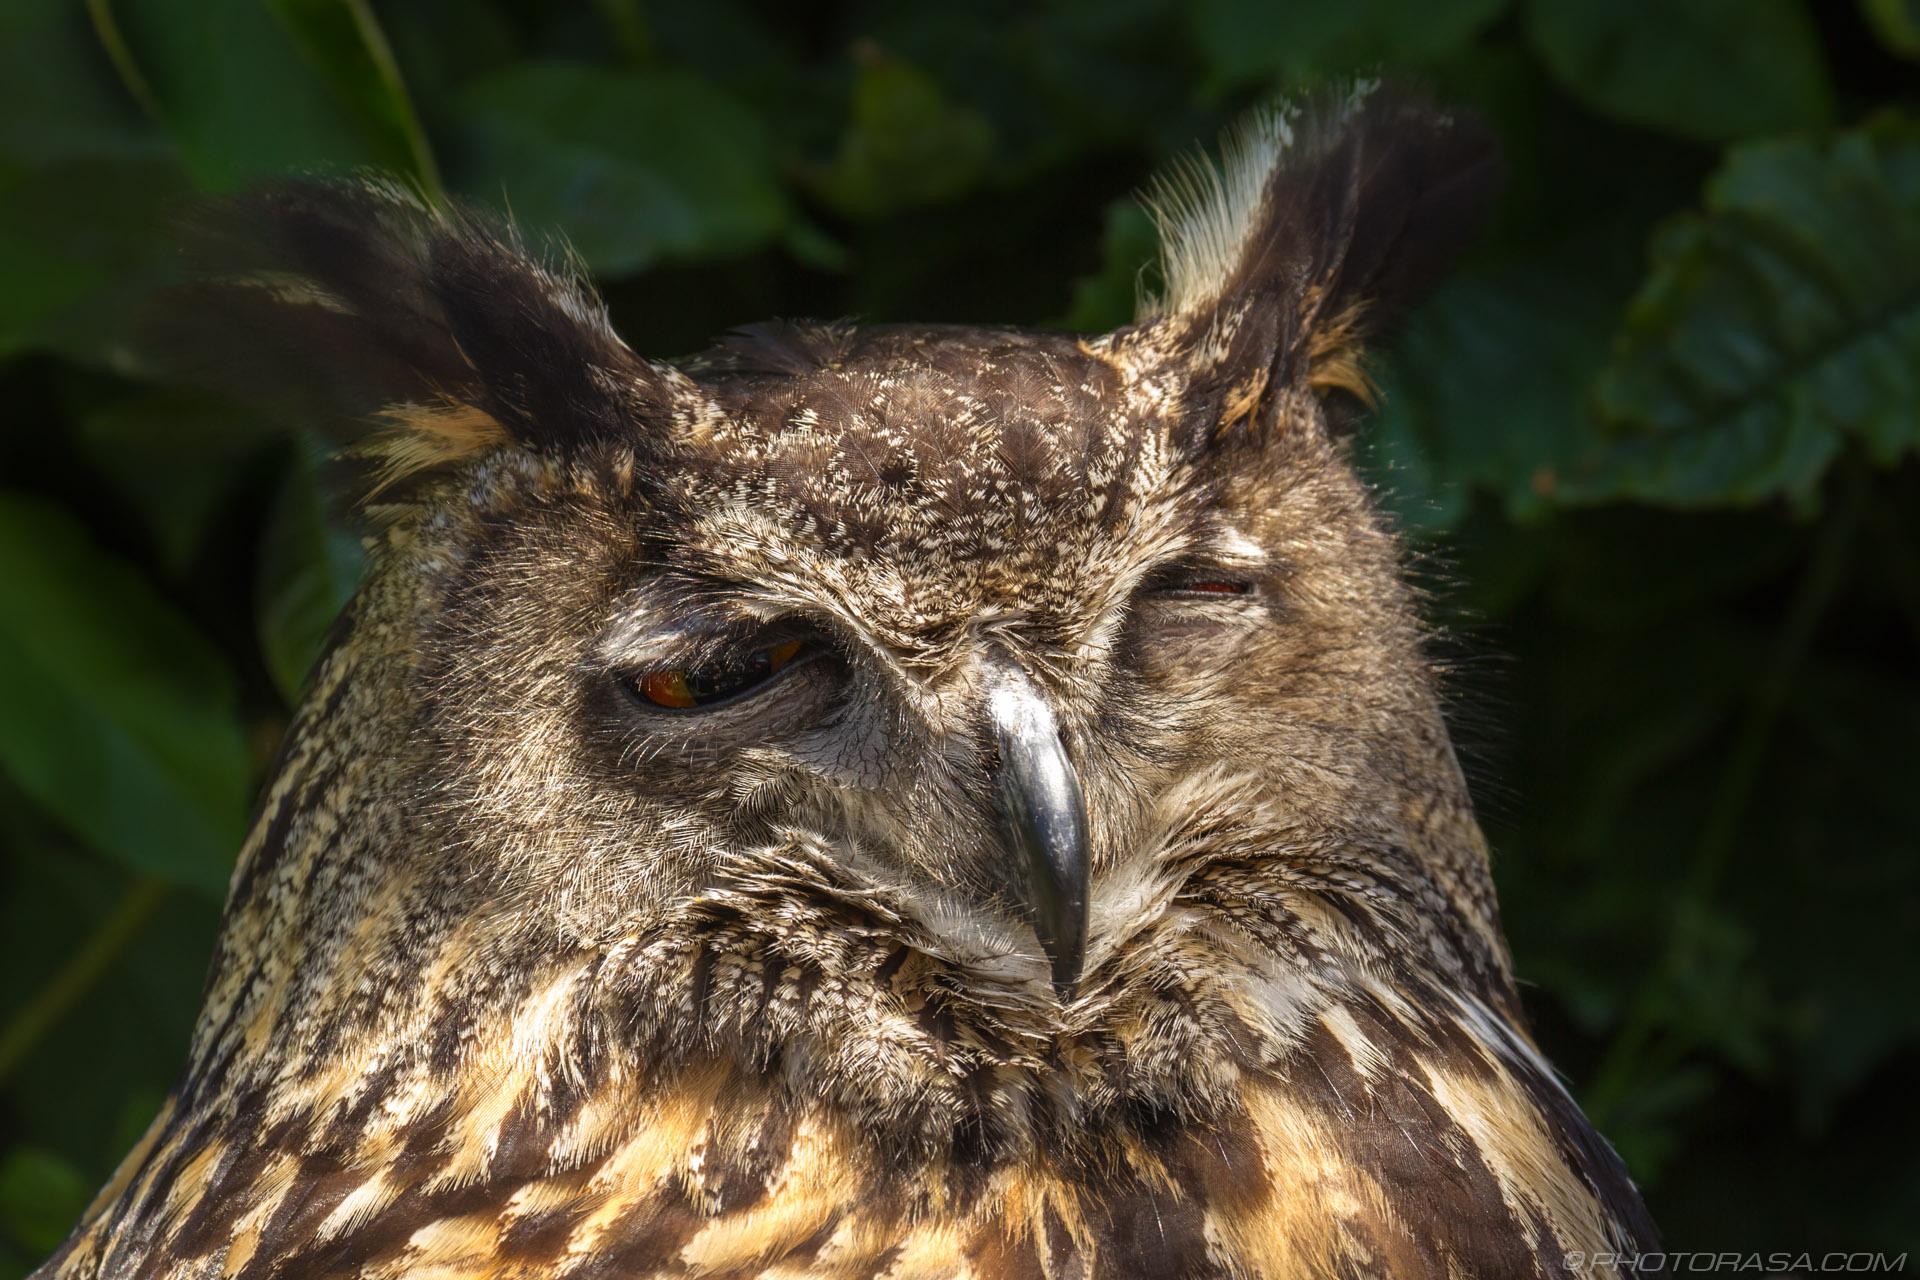 https://photorasa.com/owls/european-eagle-owl-wiith-one-eye-open/